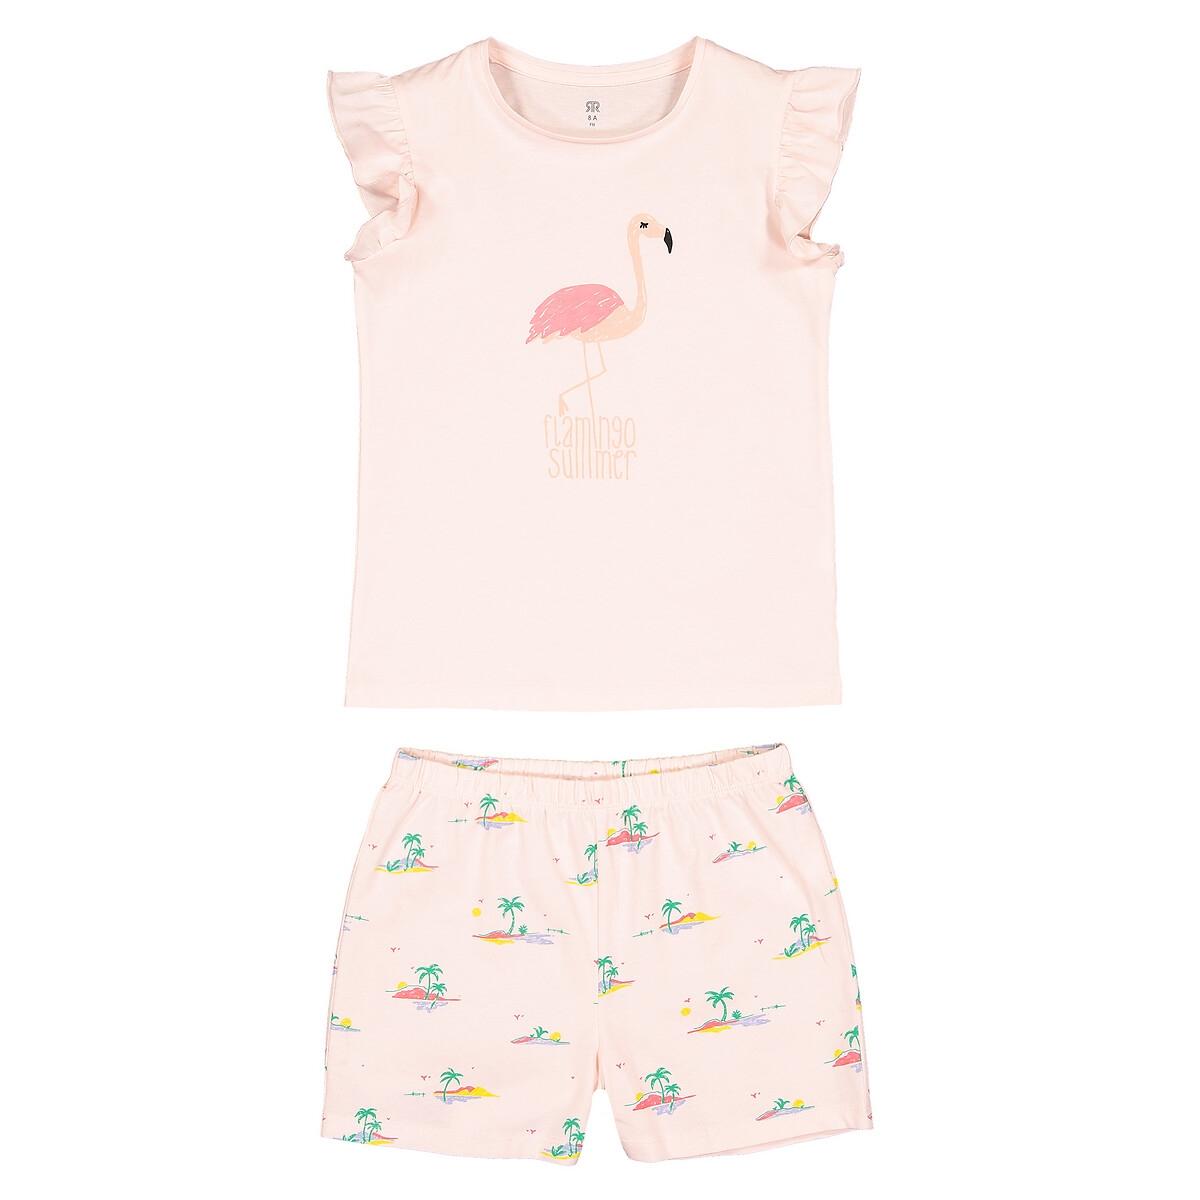 Пижама LaRedoute С шортами с рисунком розовый фламинго из биохлопка 3-12 лет 8 - 126 см